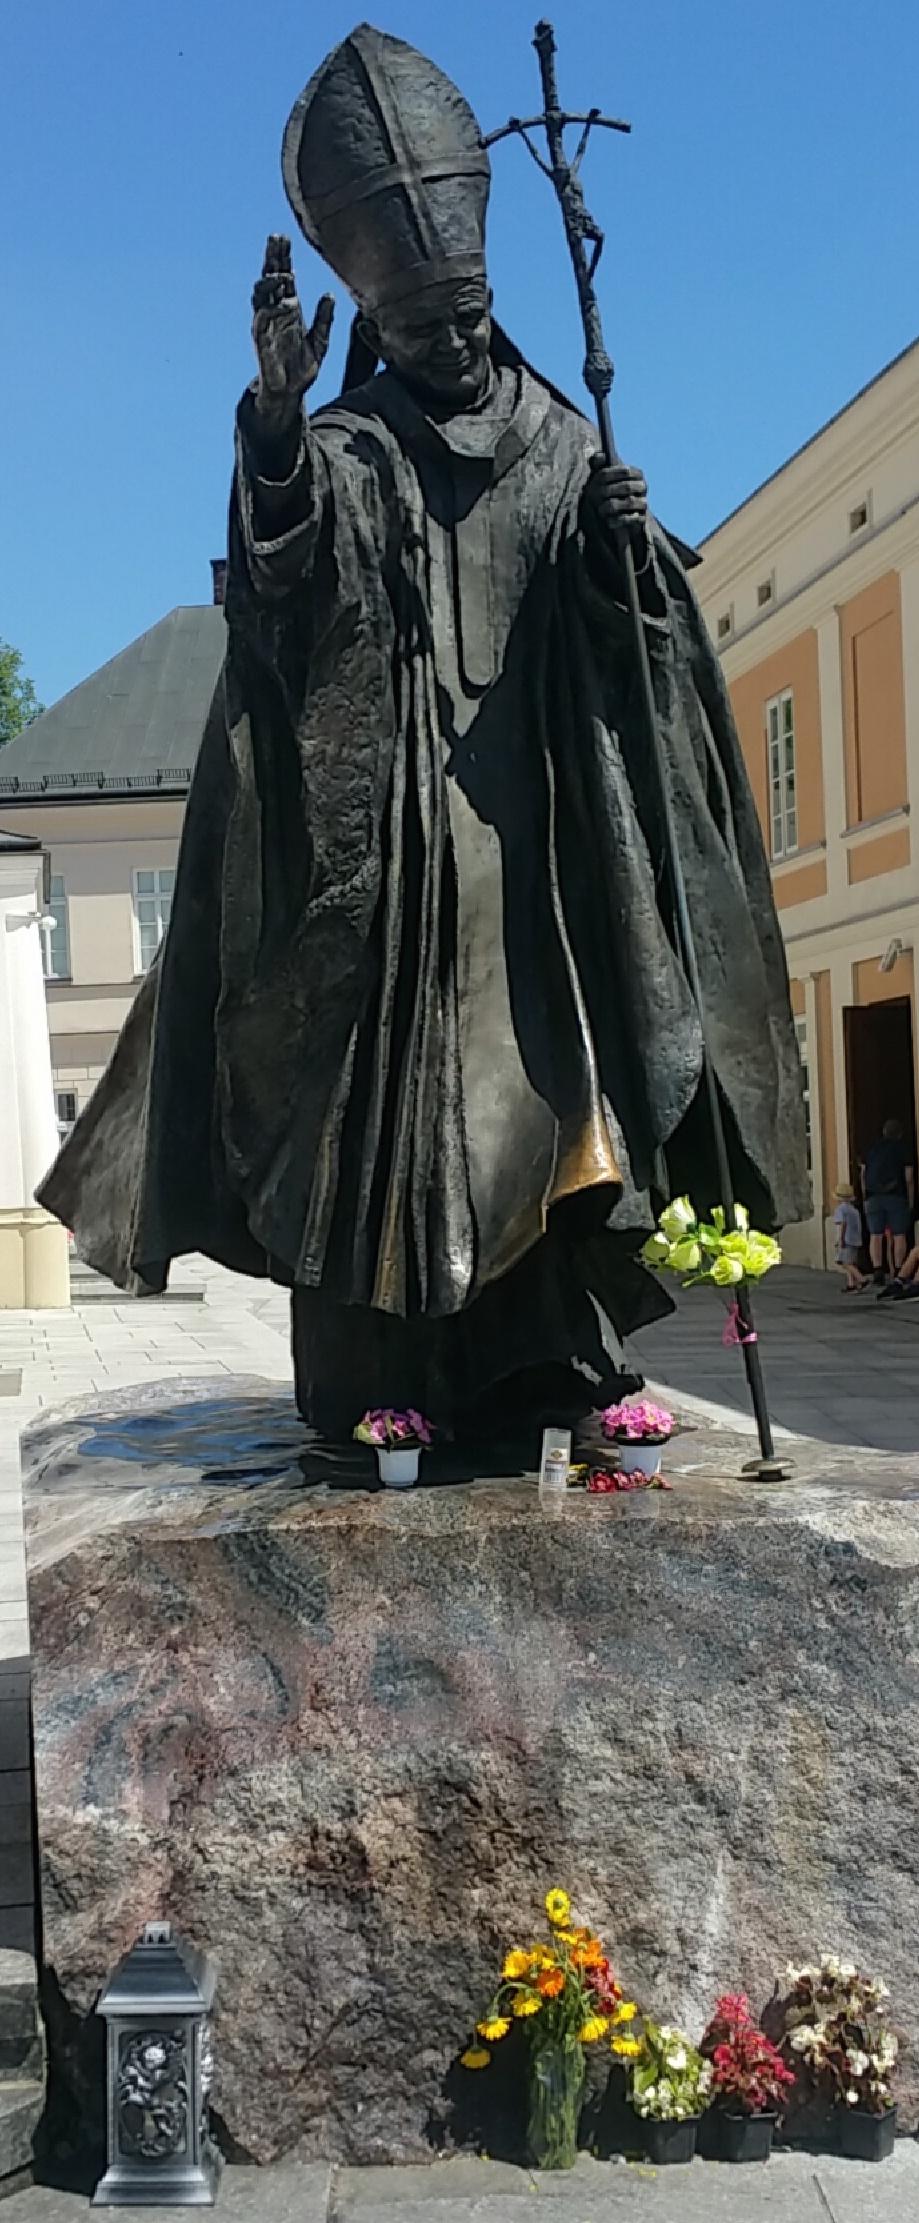 https://i1.wp.com/troubadour.francis.edu/wp-content/uploads/2016/07/Fraley-blog-2-statue.jpg